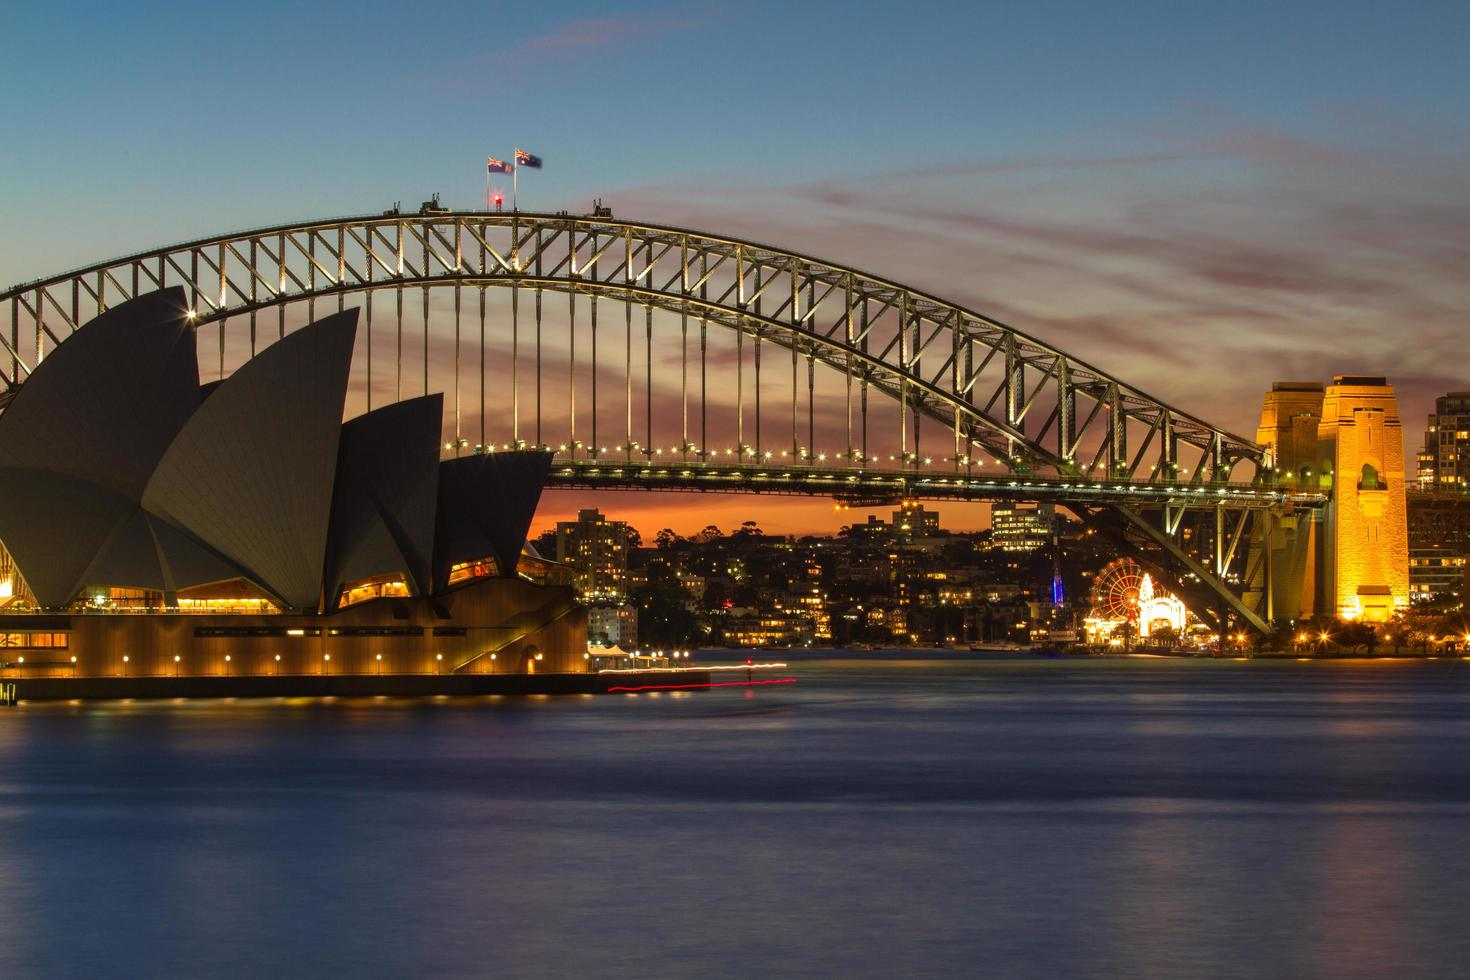 sydney, australia, 2020 - sydney opera house and bridge at night foto